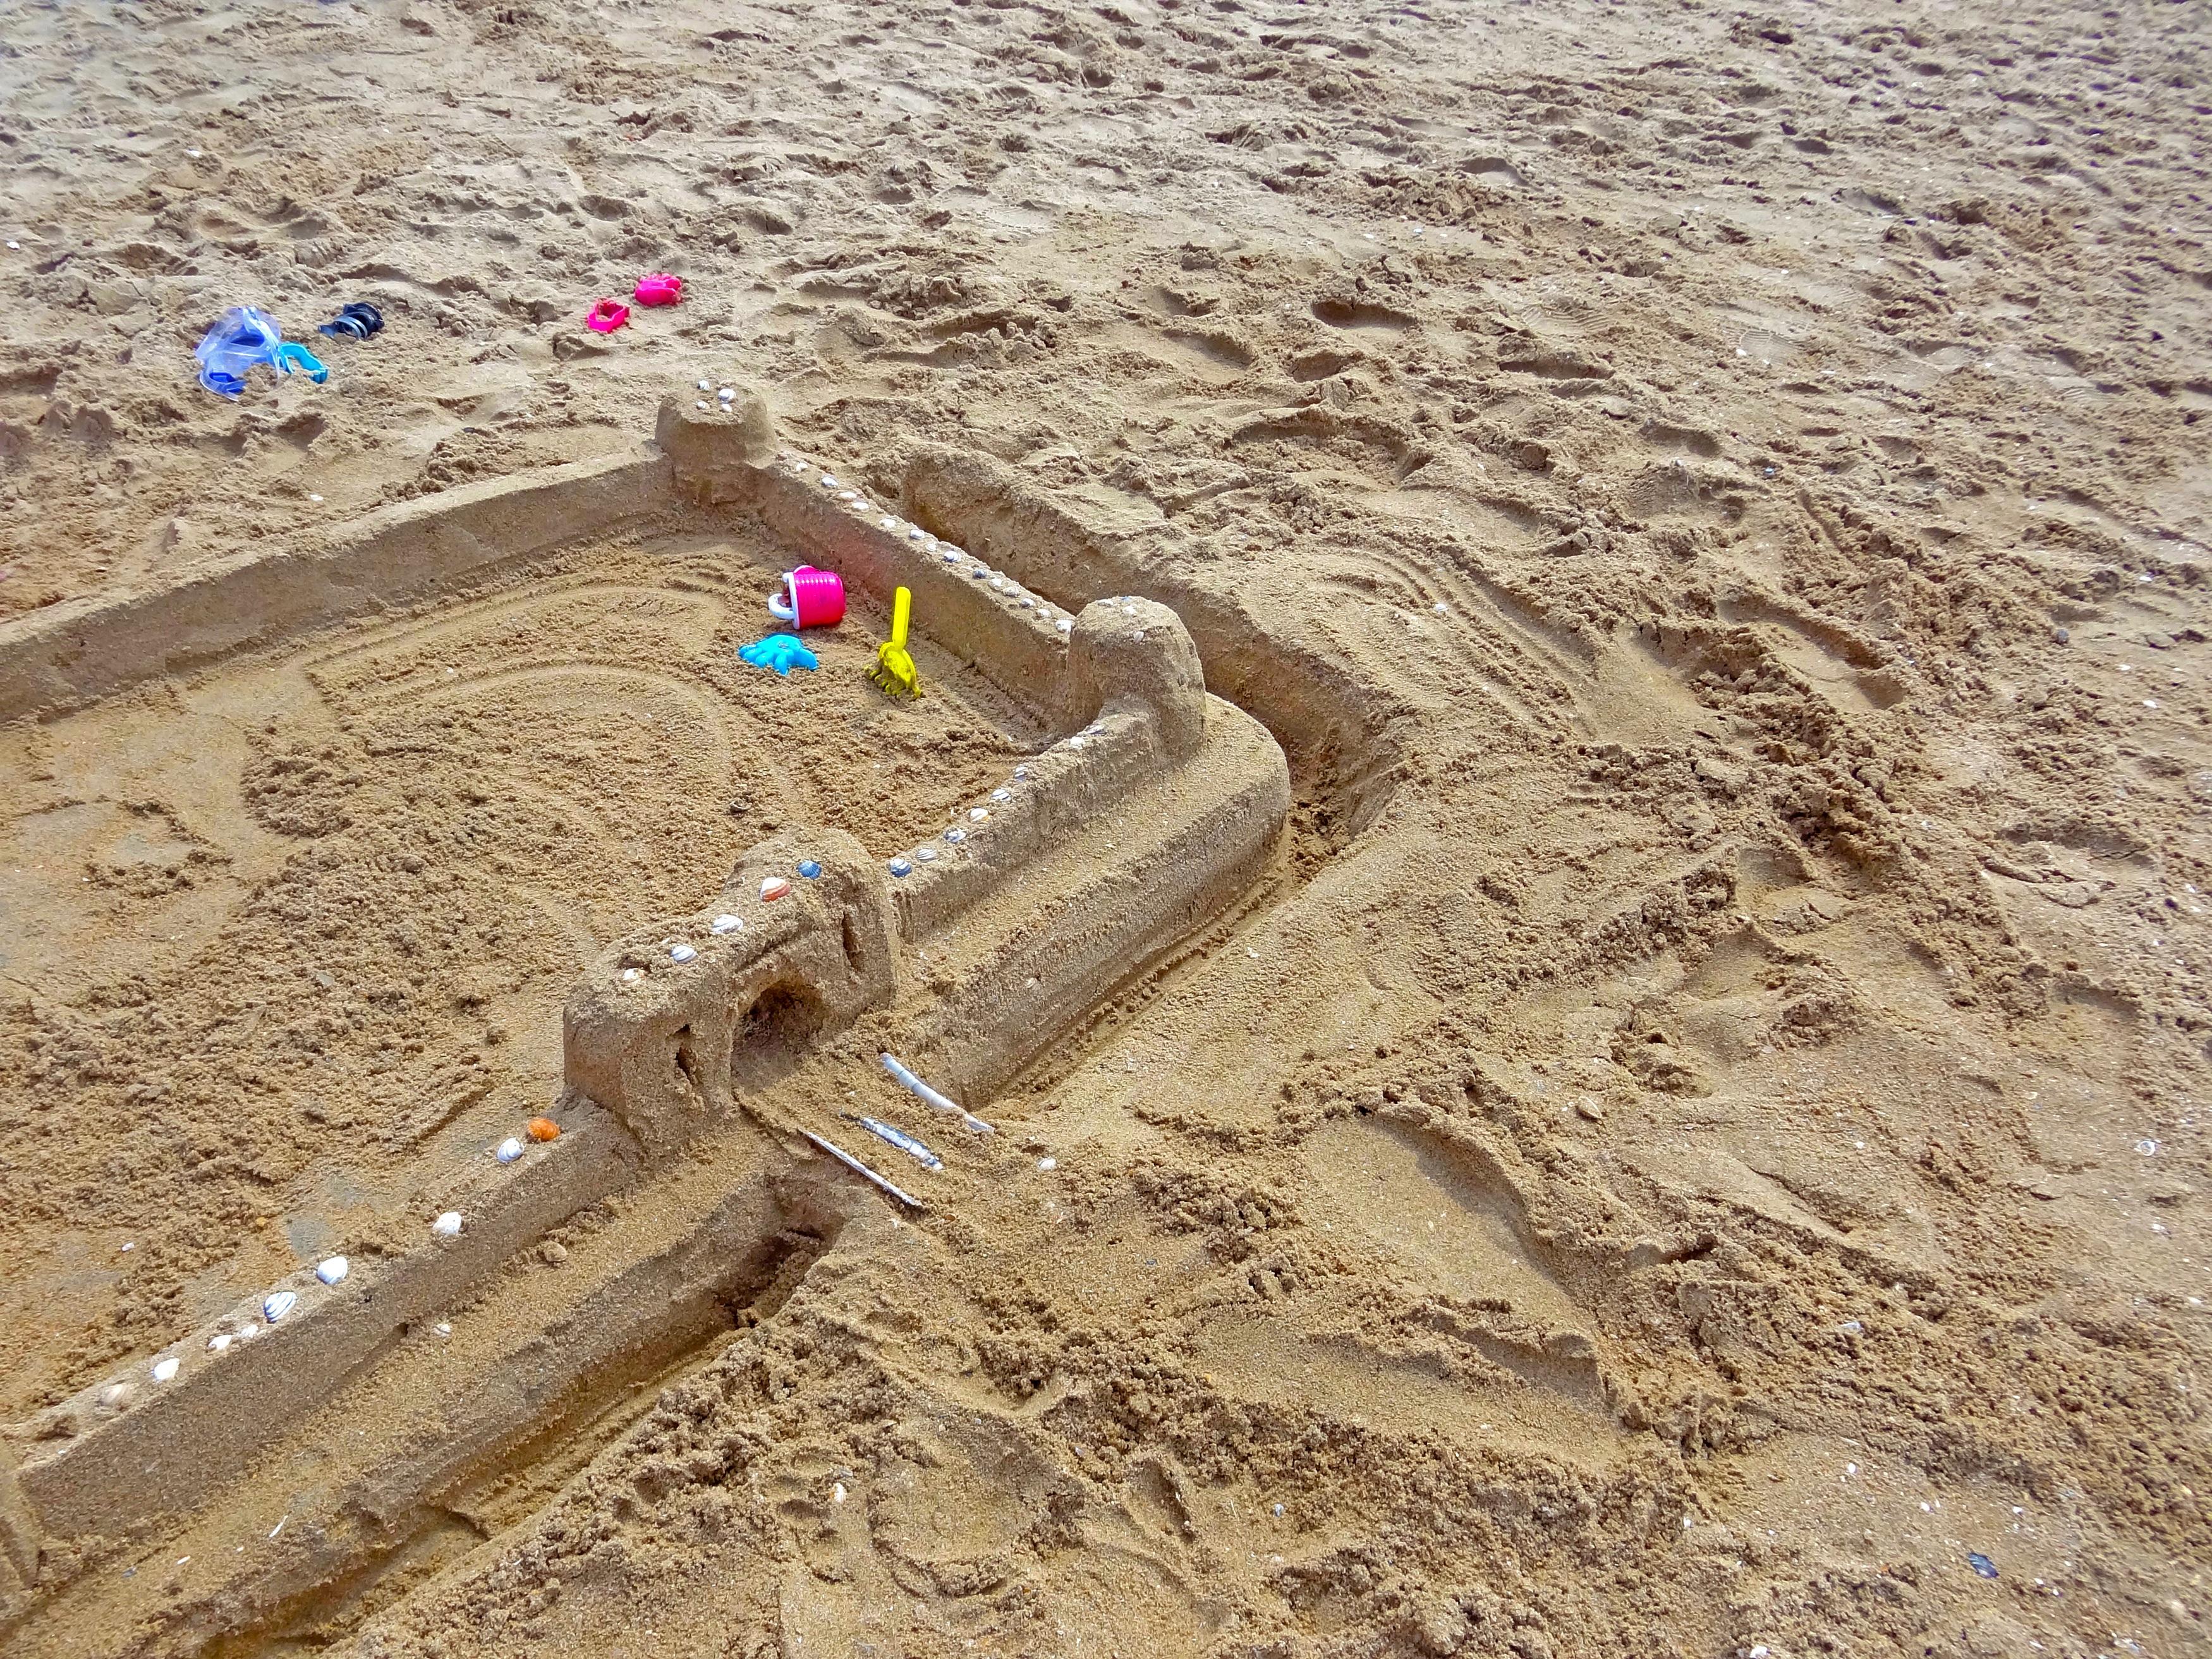 Beach Sand Construction Mud Holiday Soil Material Bucket Children Holidays Blade Rake Sandburg